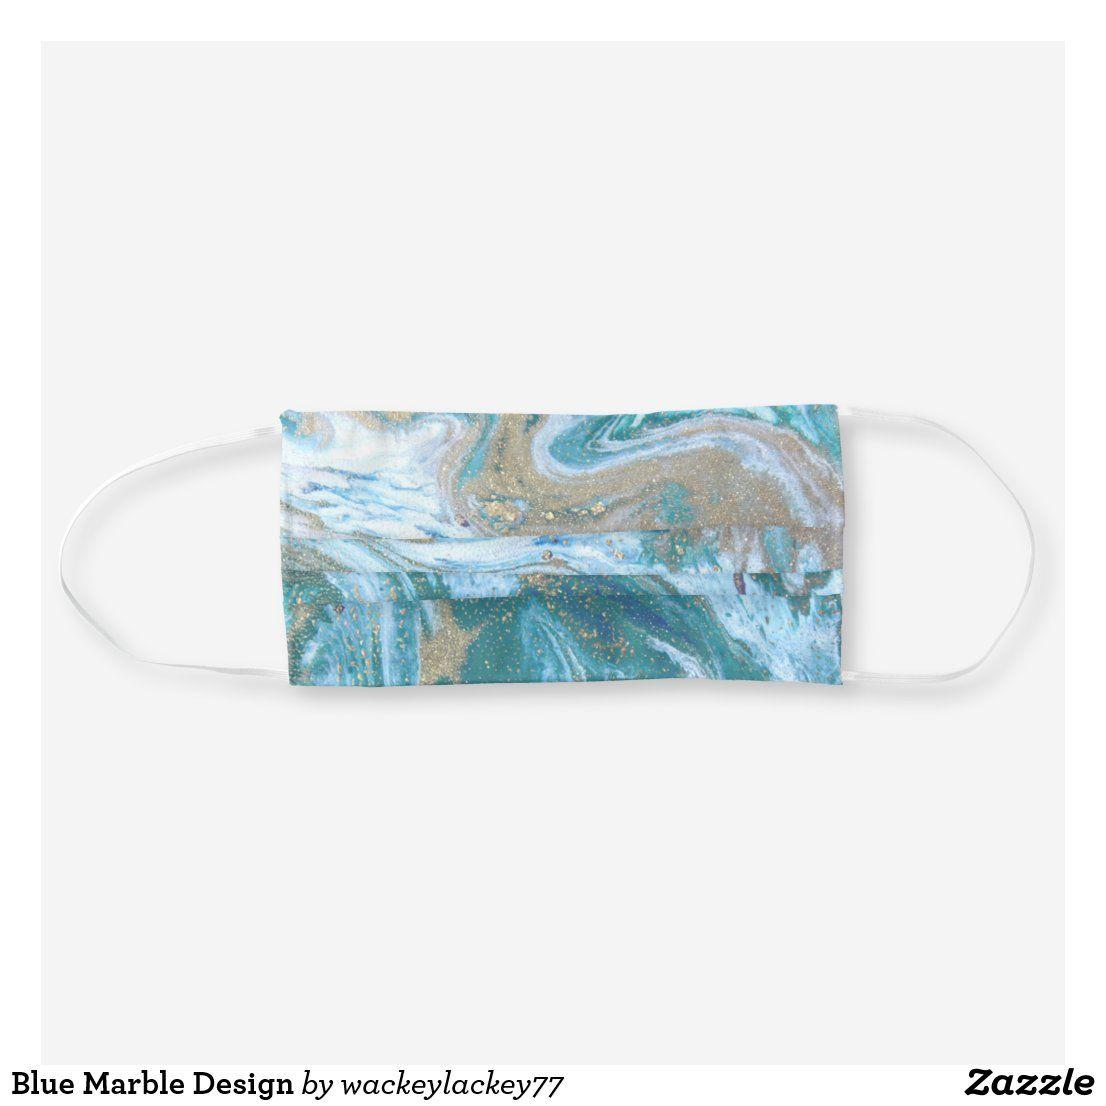 Blue Marble Design Cloth Face Mask Zazzle Com In 2020 Face Mask Blue Marble Marble Design